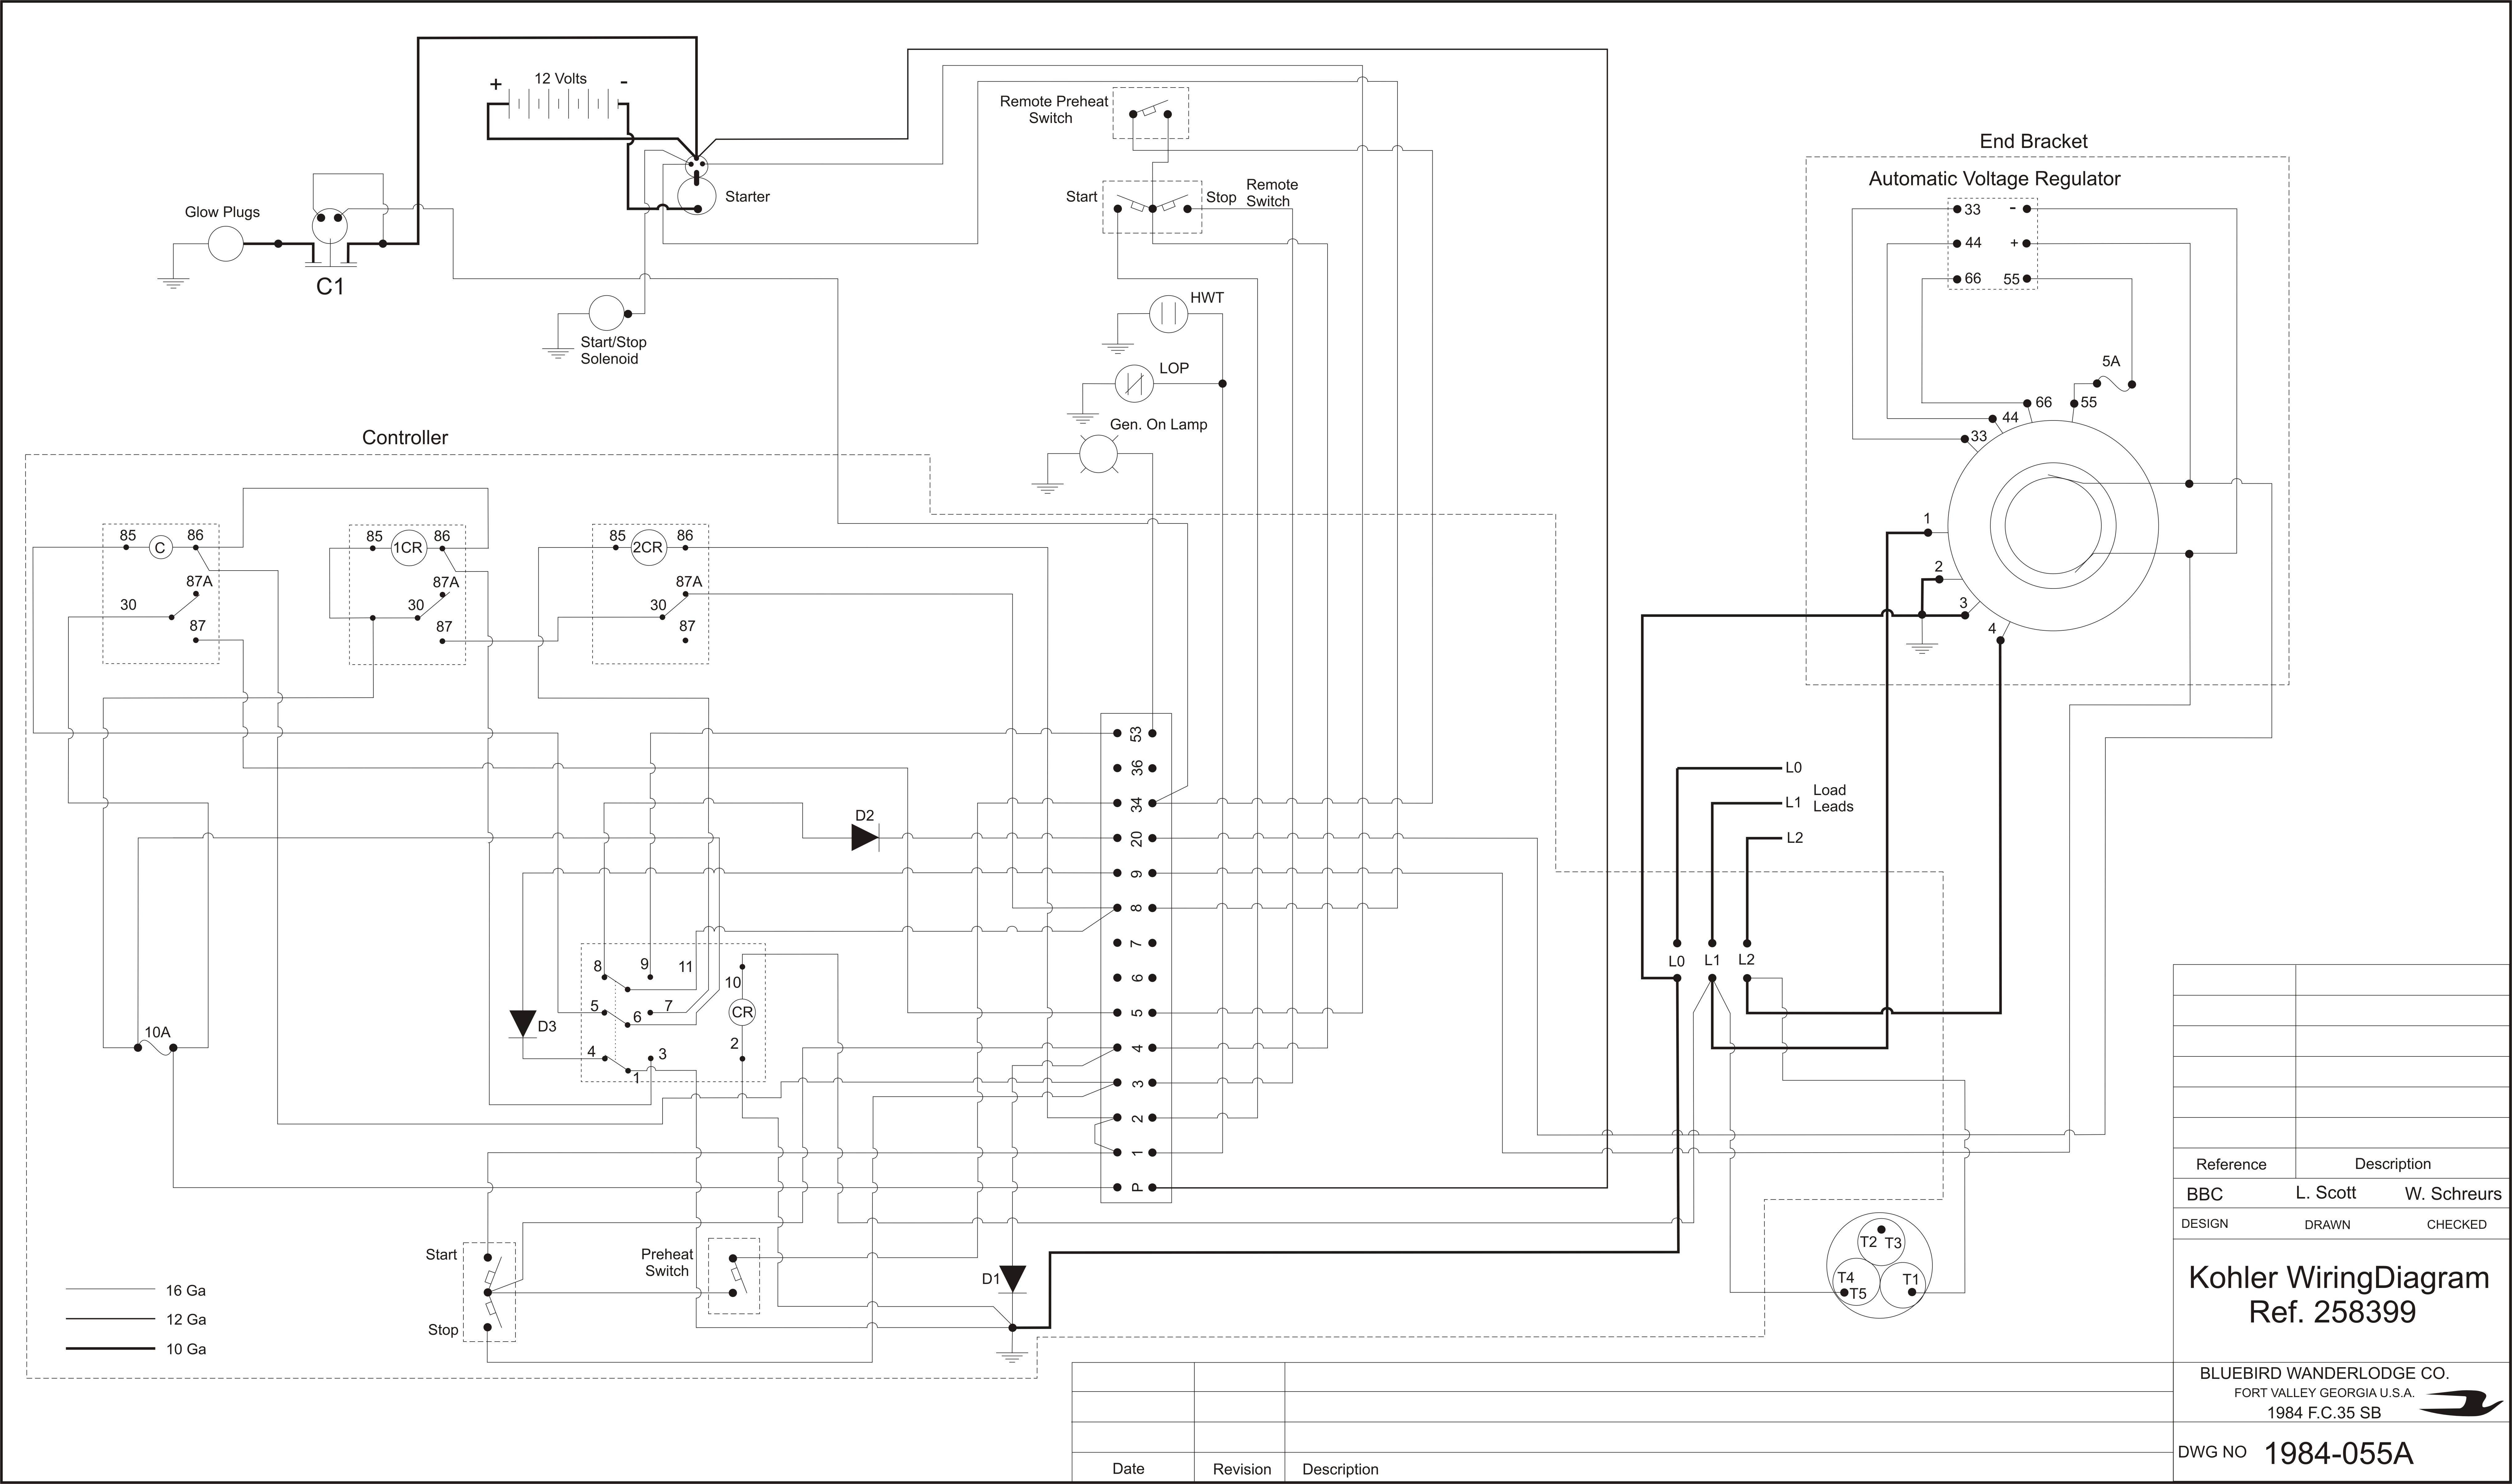 Wanderlodgeownersgroup Com  Downloads  Generator  Kohler Drawings